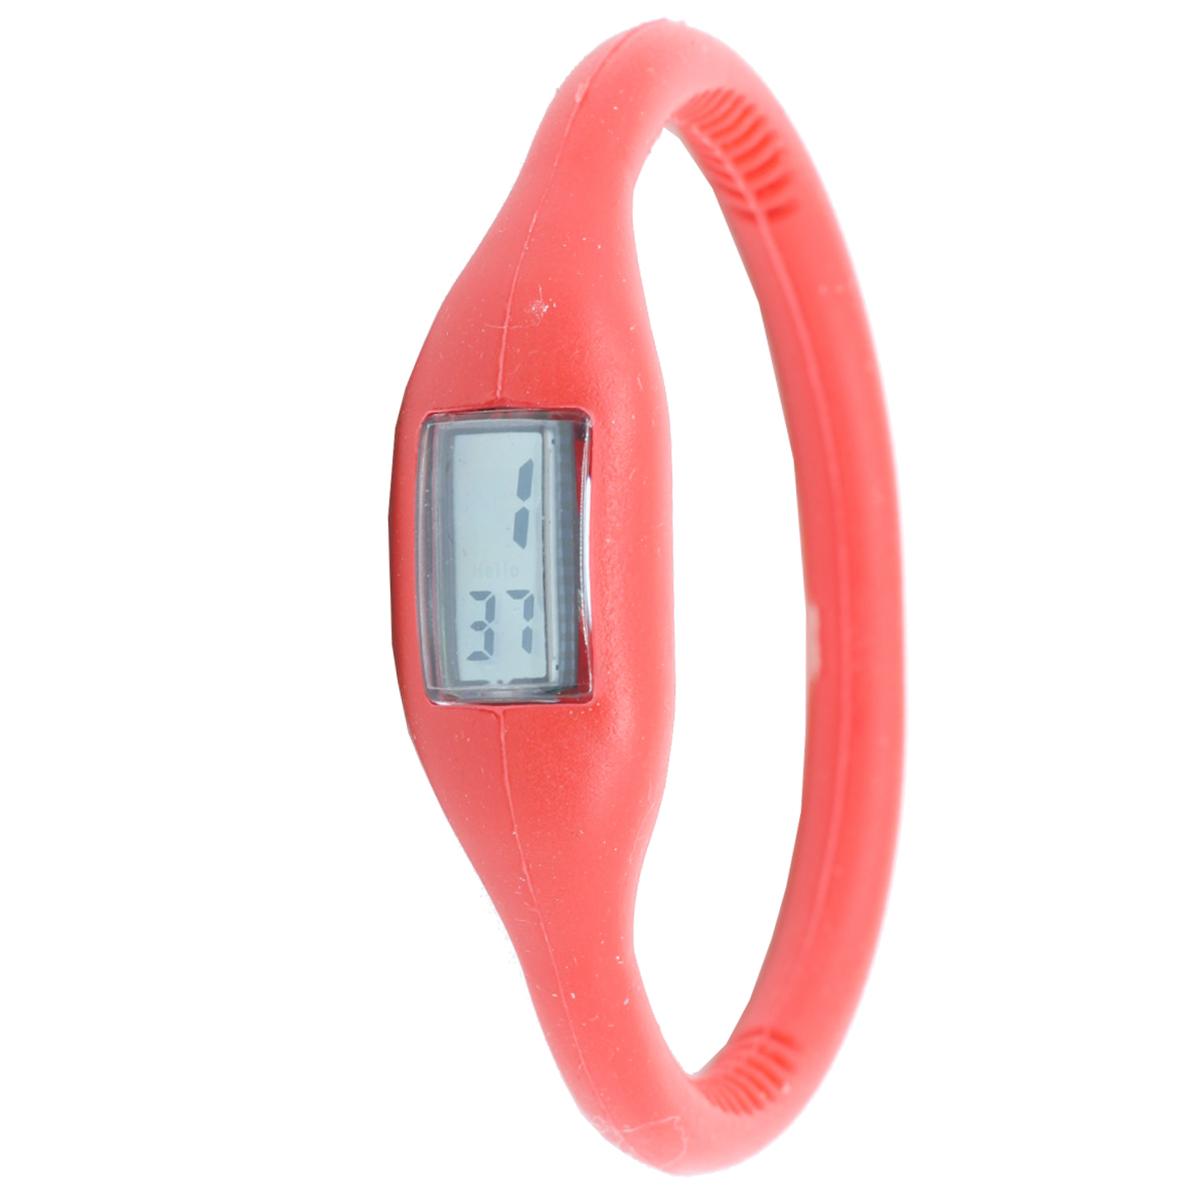 57b3111047a6 Reloj De Pulsera Christian Gar Digital Para Mujer. Modelo Cg08247-r